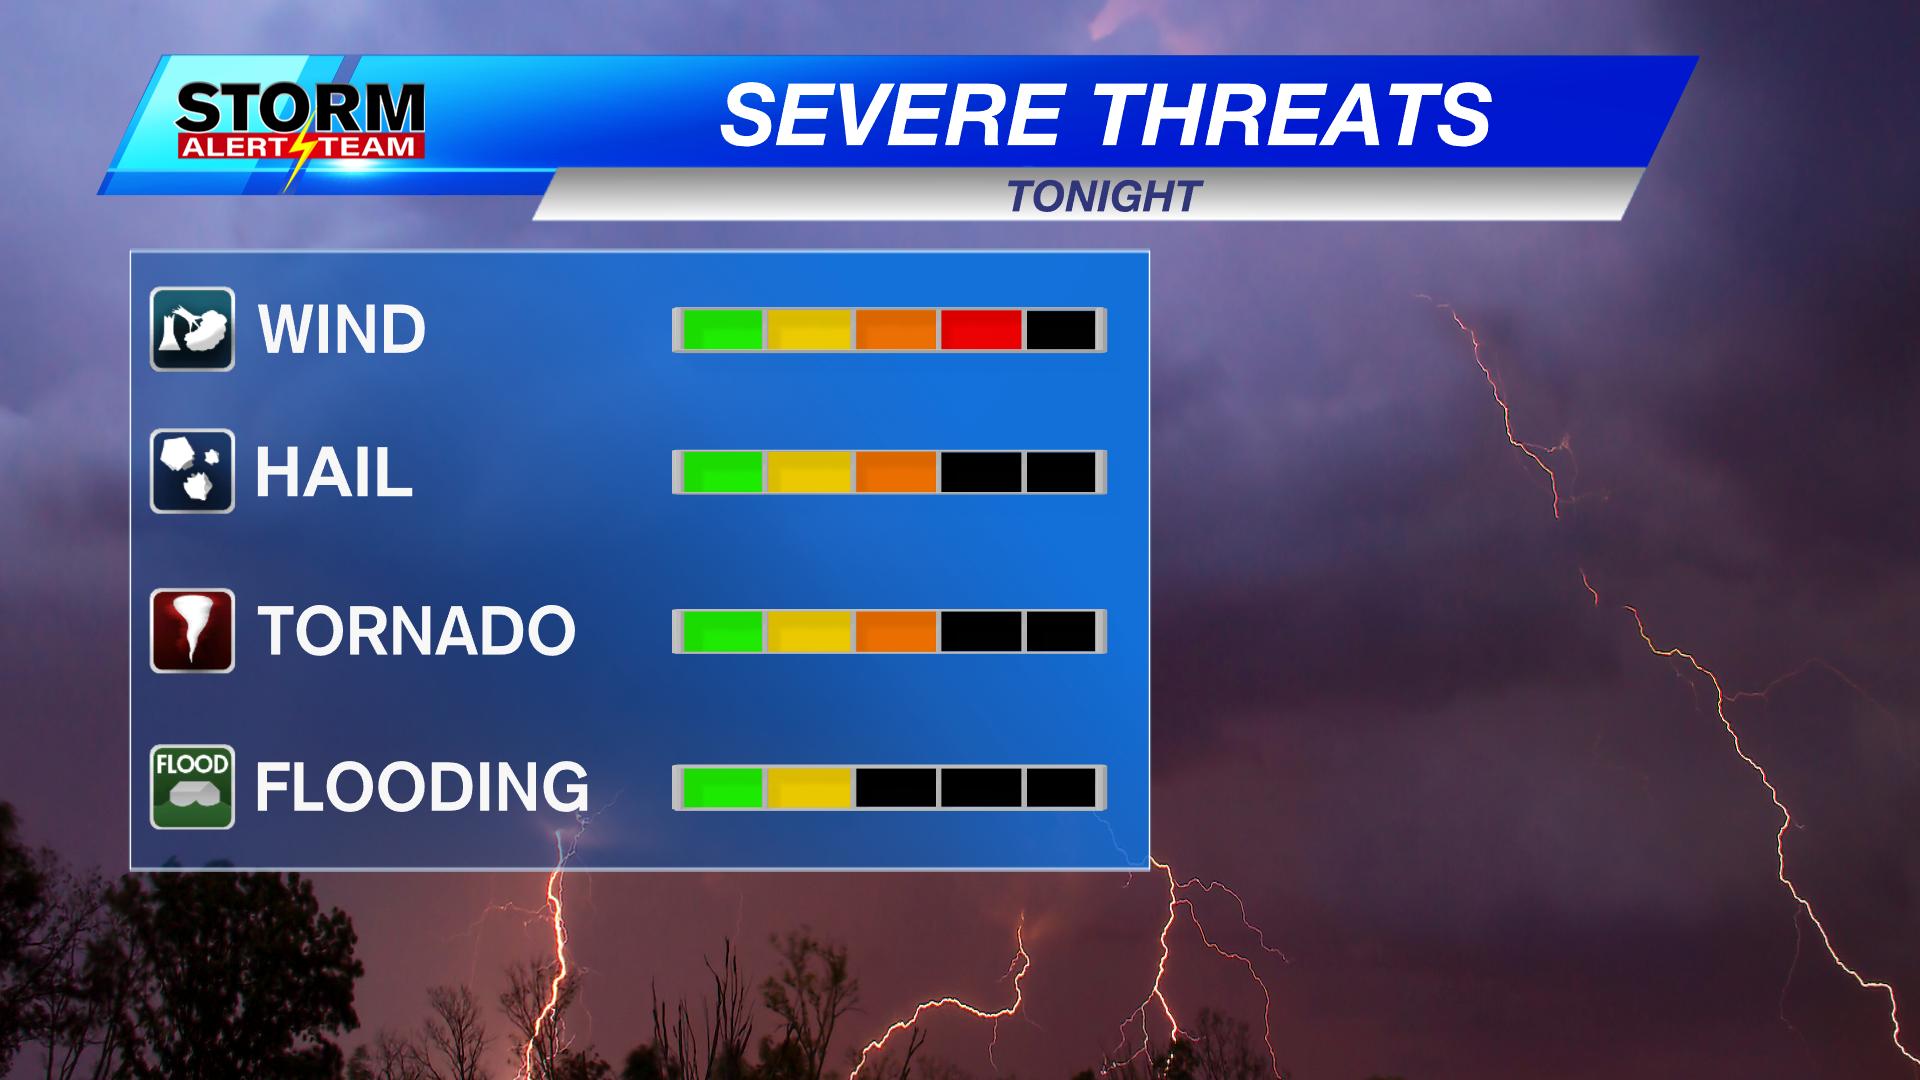 Severe Storm Threat Assessment